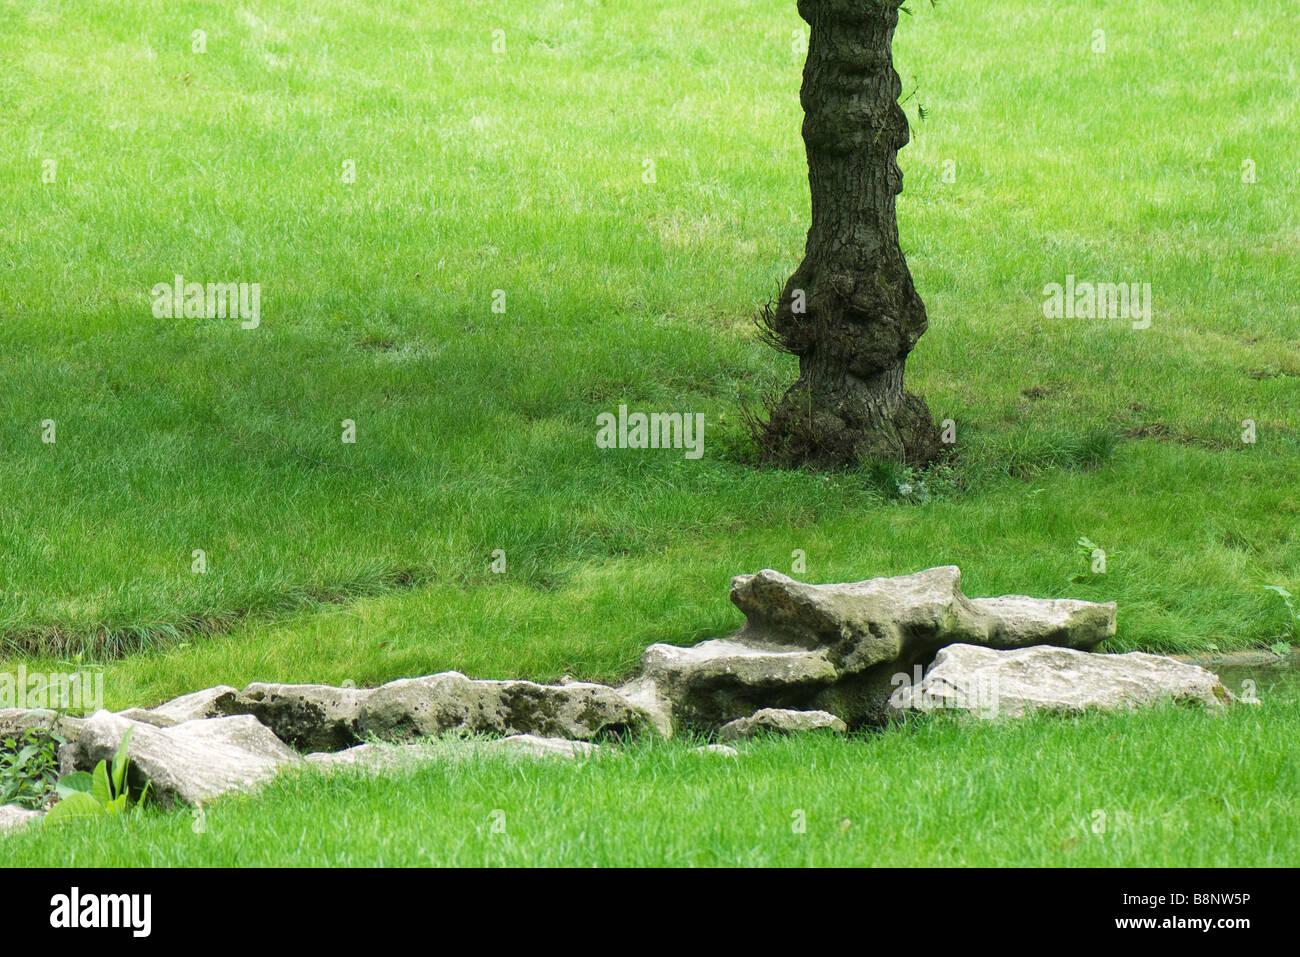 Park scene with rocks, tree trunk - Stock Image